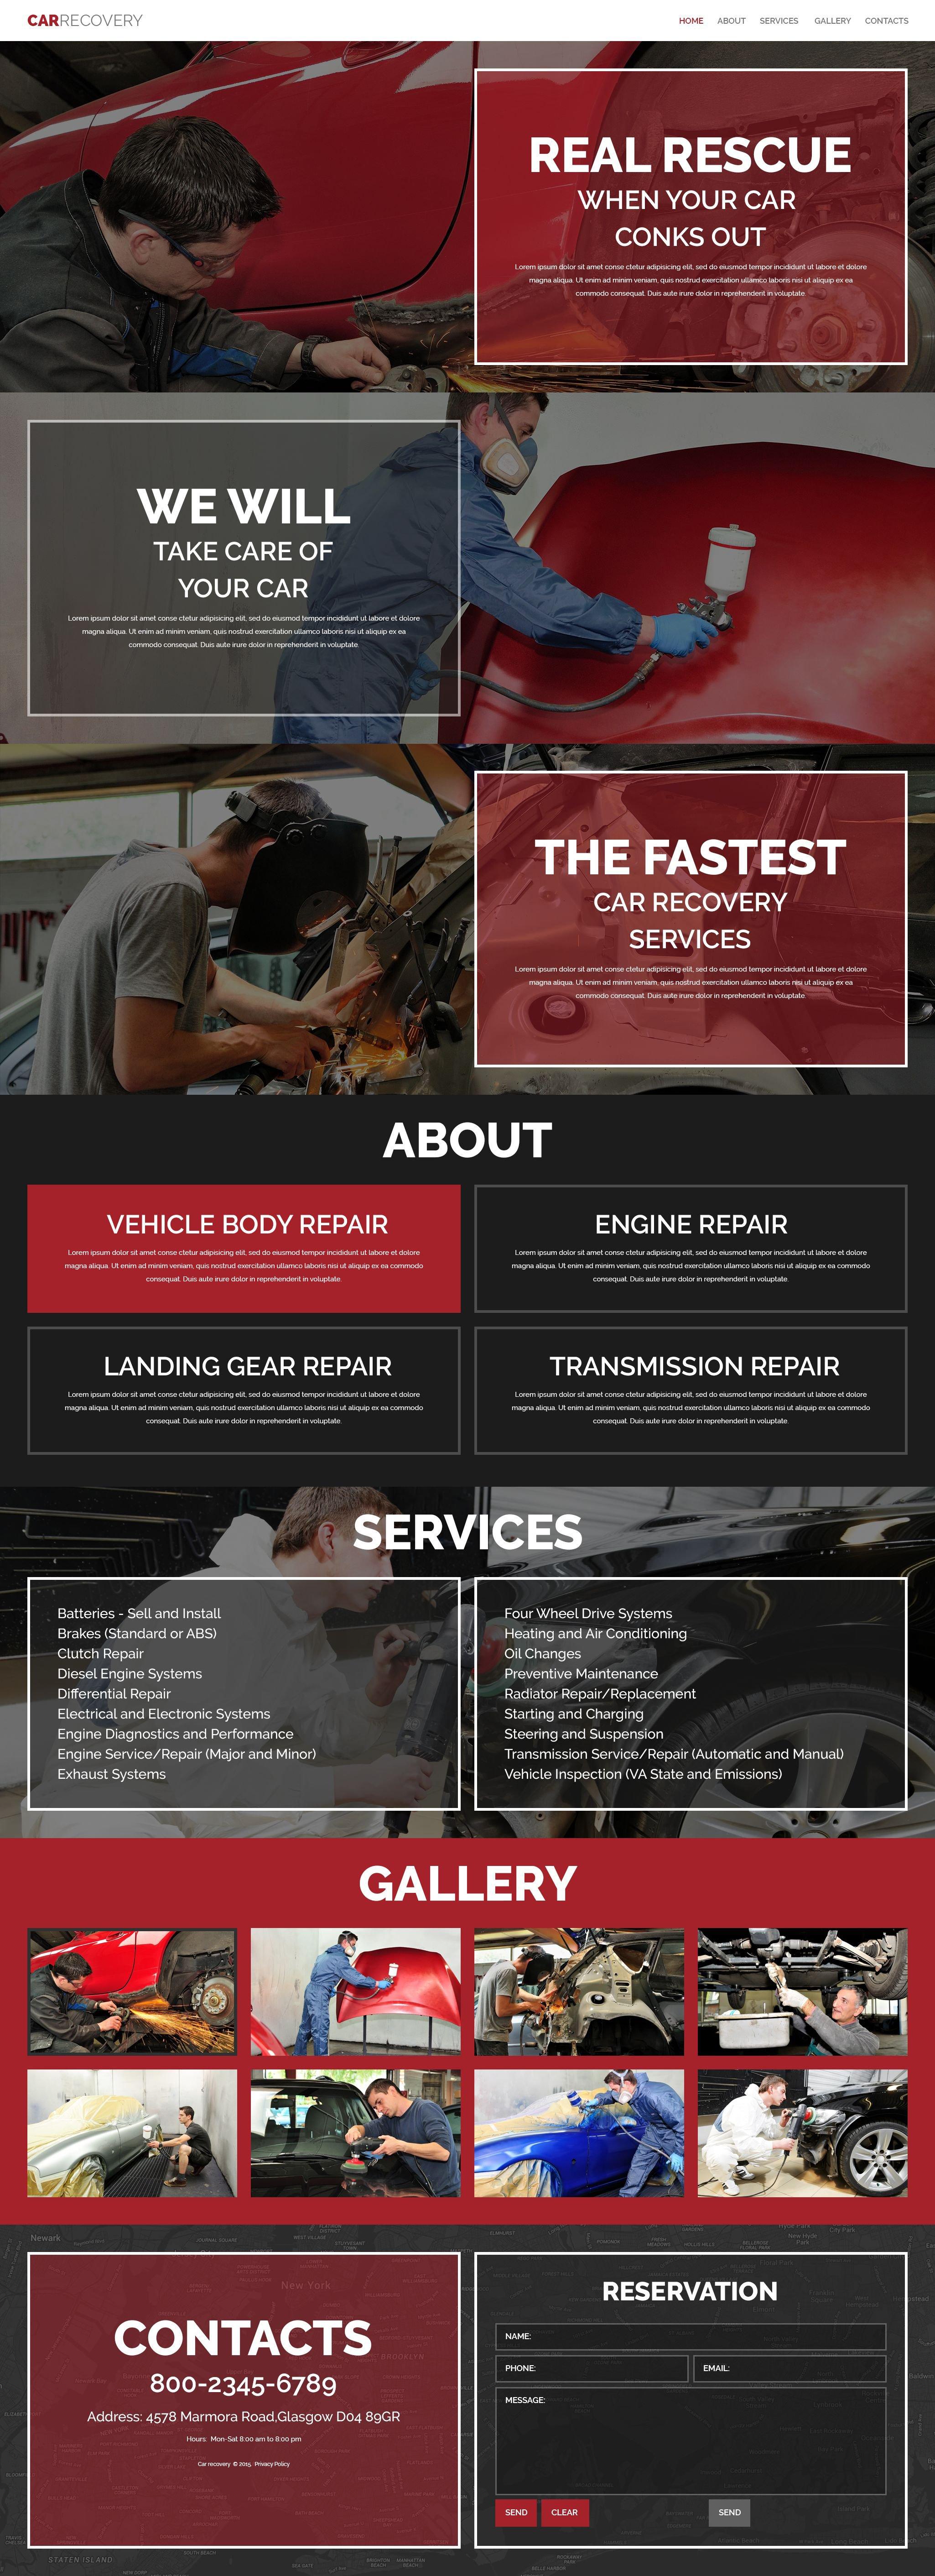 Car Repair Facility Website Template - screenshot